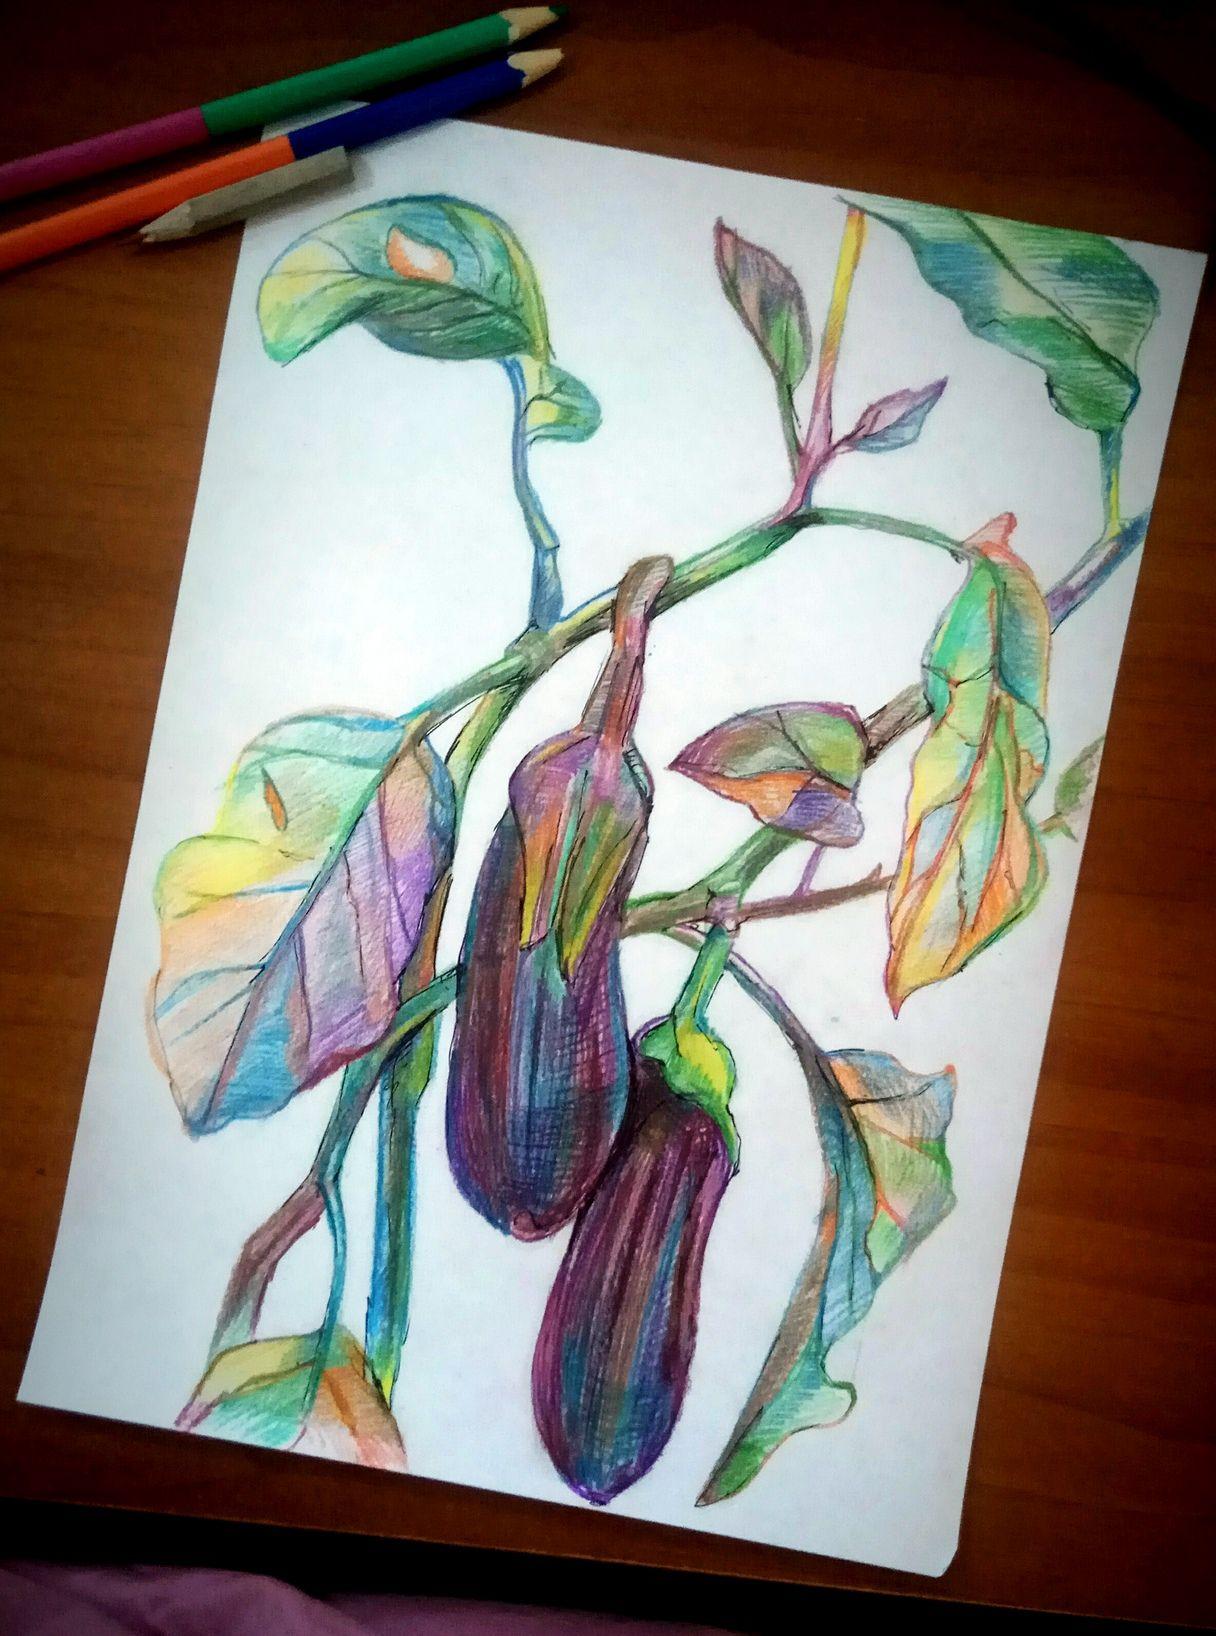 бананы баклажаны обощи лук рисунок гранат морковь карандаши фрукты натюрморт цветные